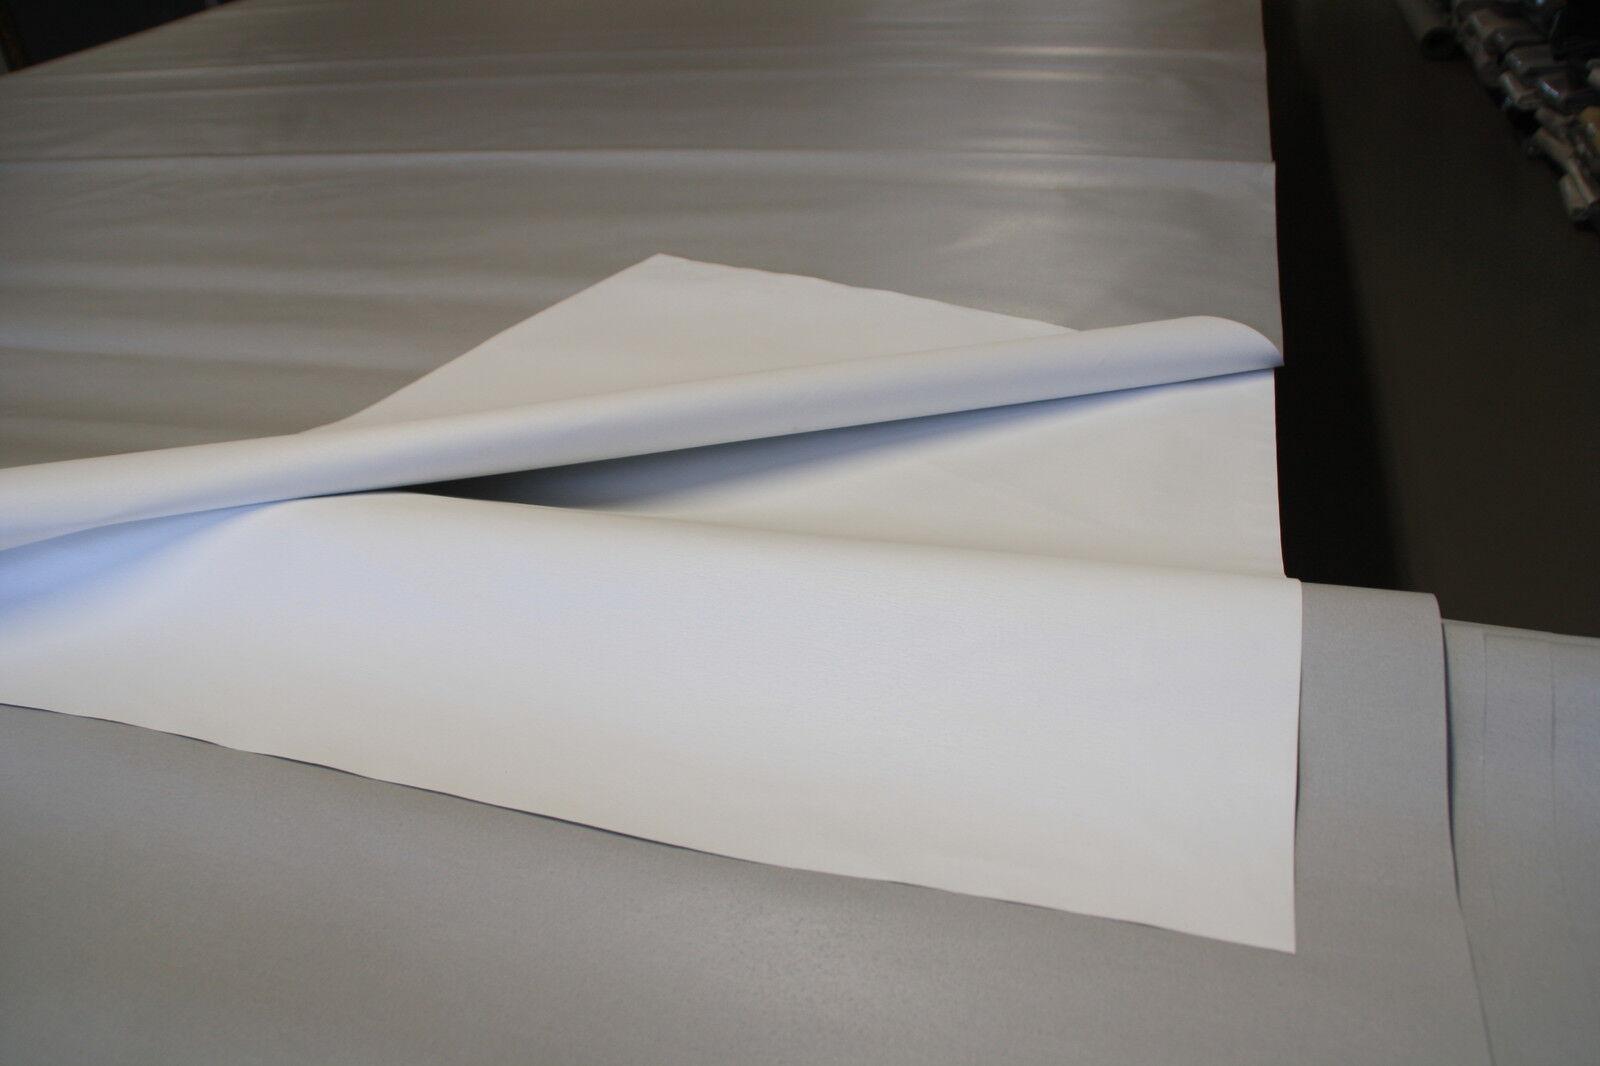 Airtex Magic 1,90   m² 360g m ² gris claro-blancoo lona cobertora lona diferentes Tallas